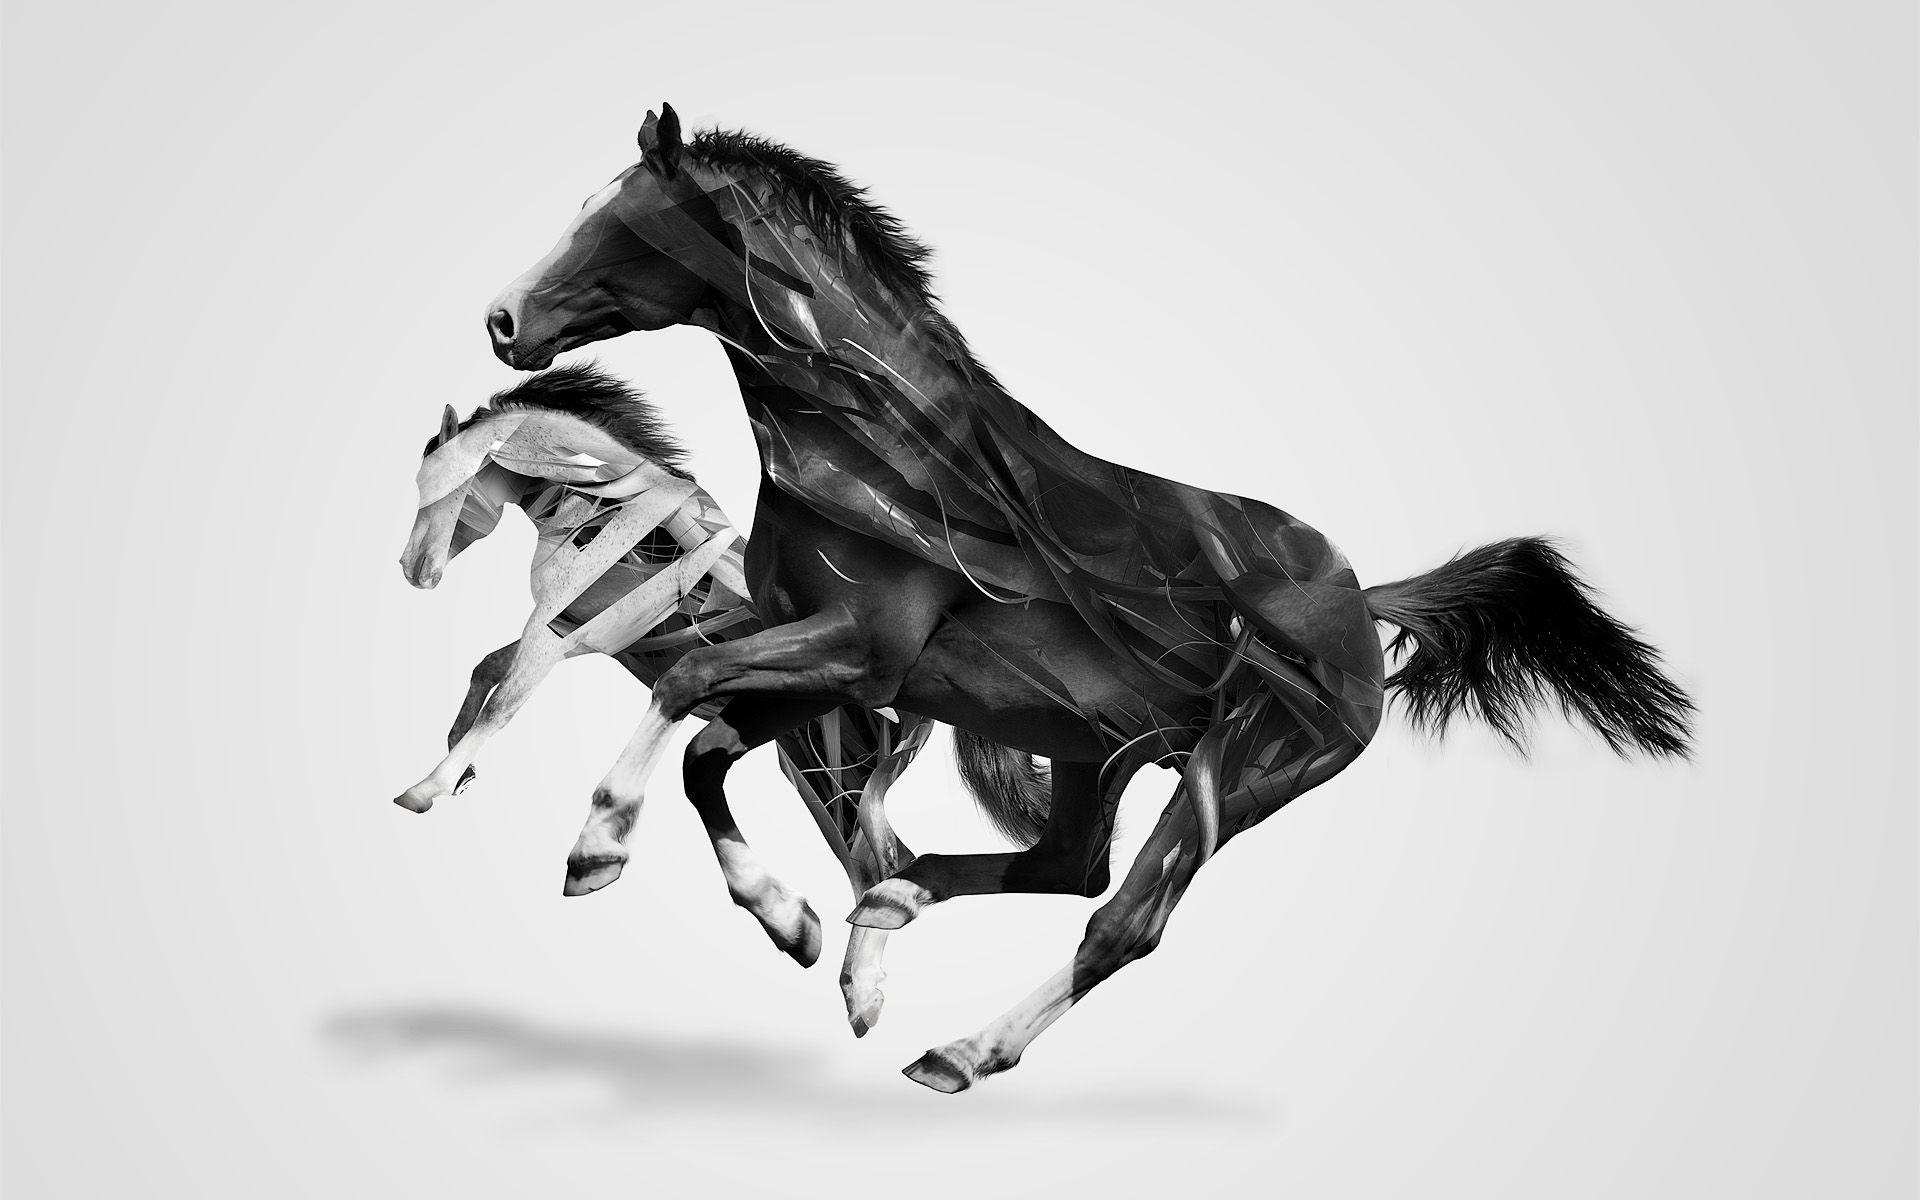 Fantastic Wallpaper Horse Collage - 3dcc54e5b4f5635d3b6580a5ebfc7d87  Collection_266869.jpg